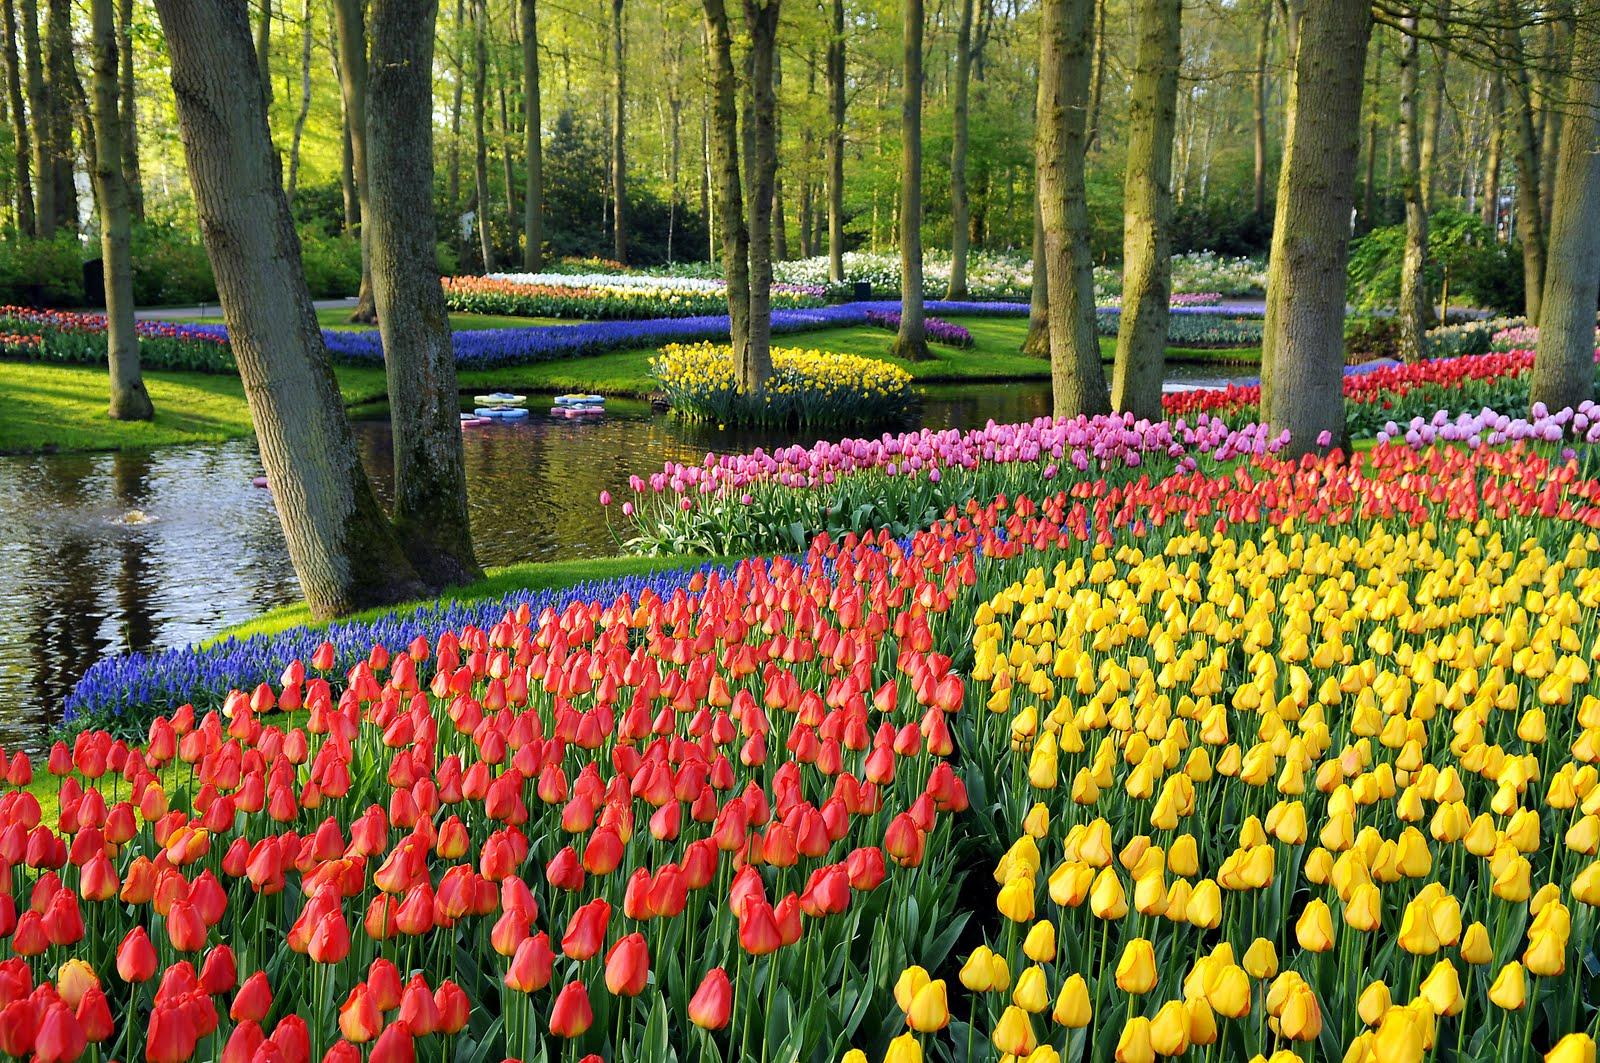 jardim de tulipas Keukenhof | foto: laidbackgardener.wordpress.com